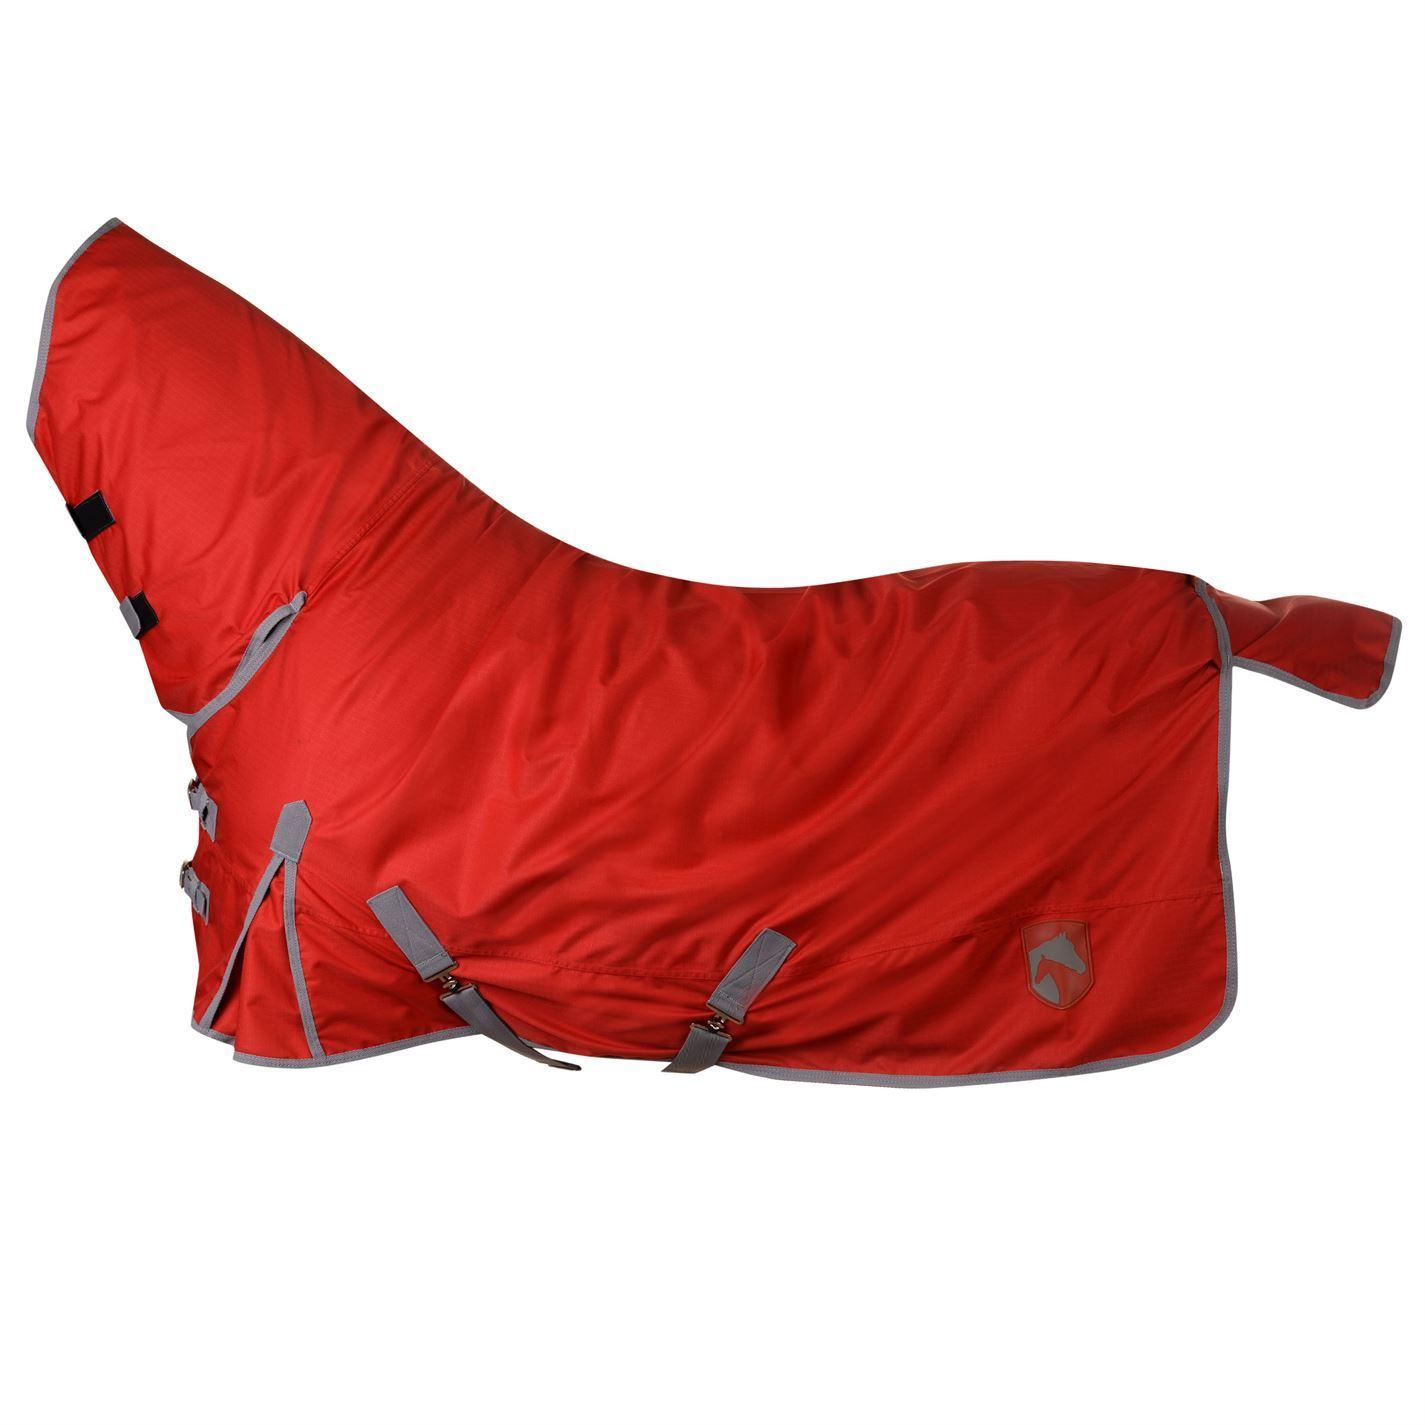 Requisite 600 600 Requisite Lite Combo Turnout Unisex Horse Rug Water Repellent Ventilated 1ea370